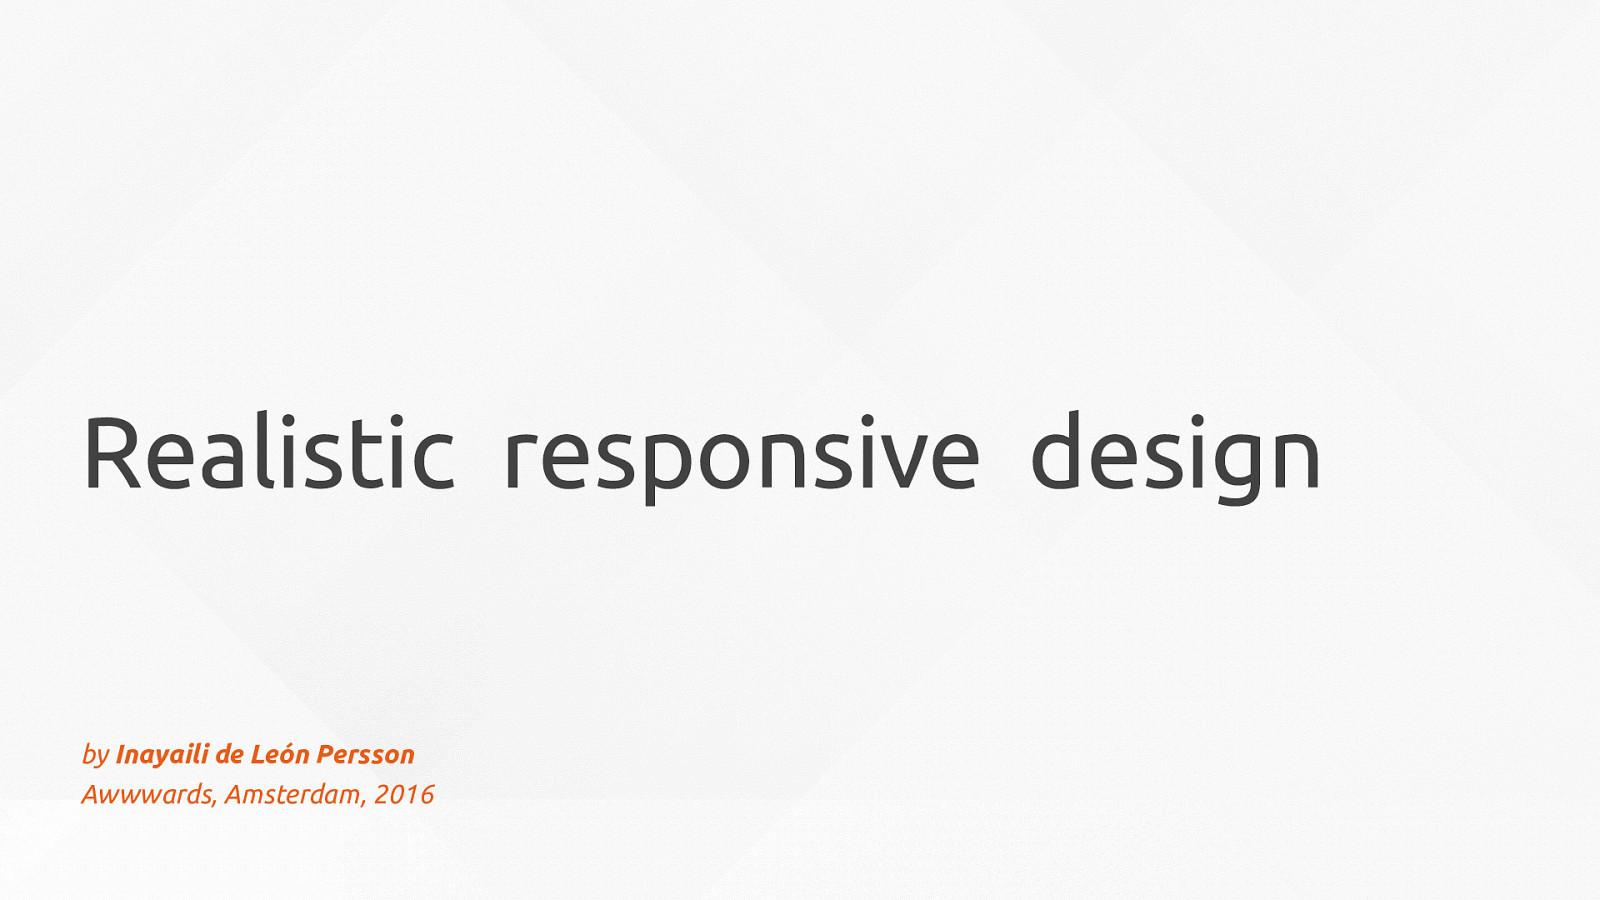 Realistic responsive design